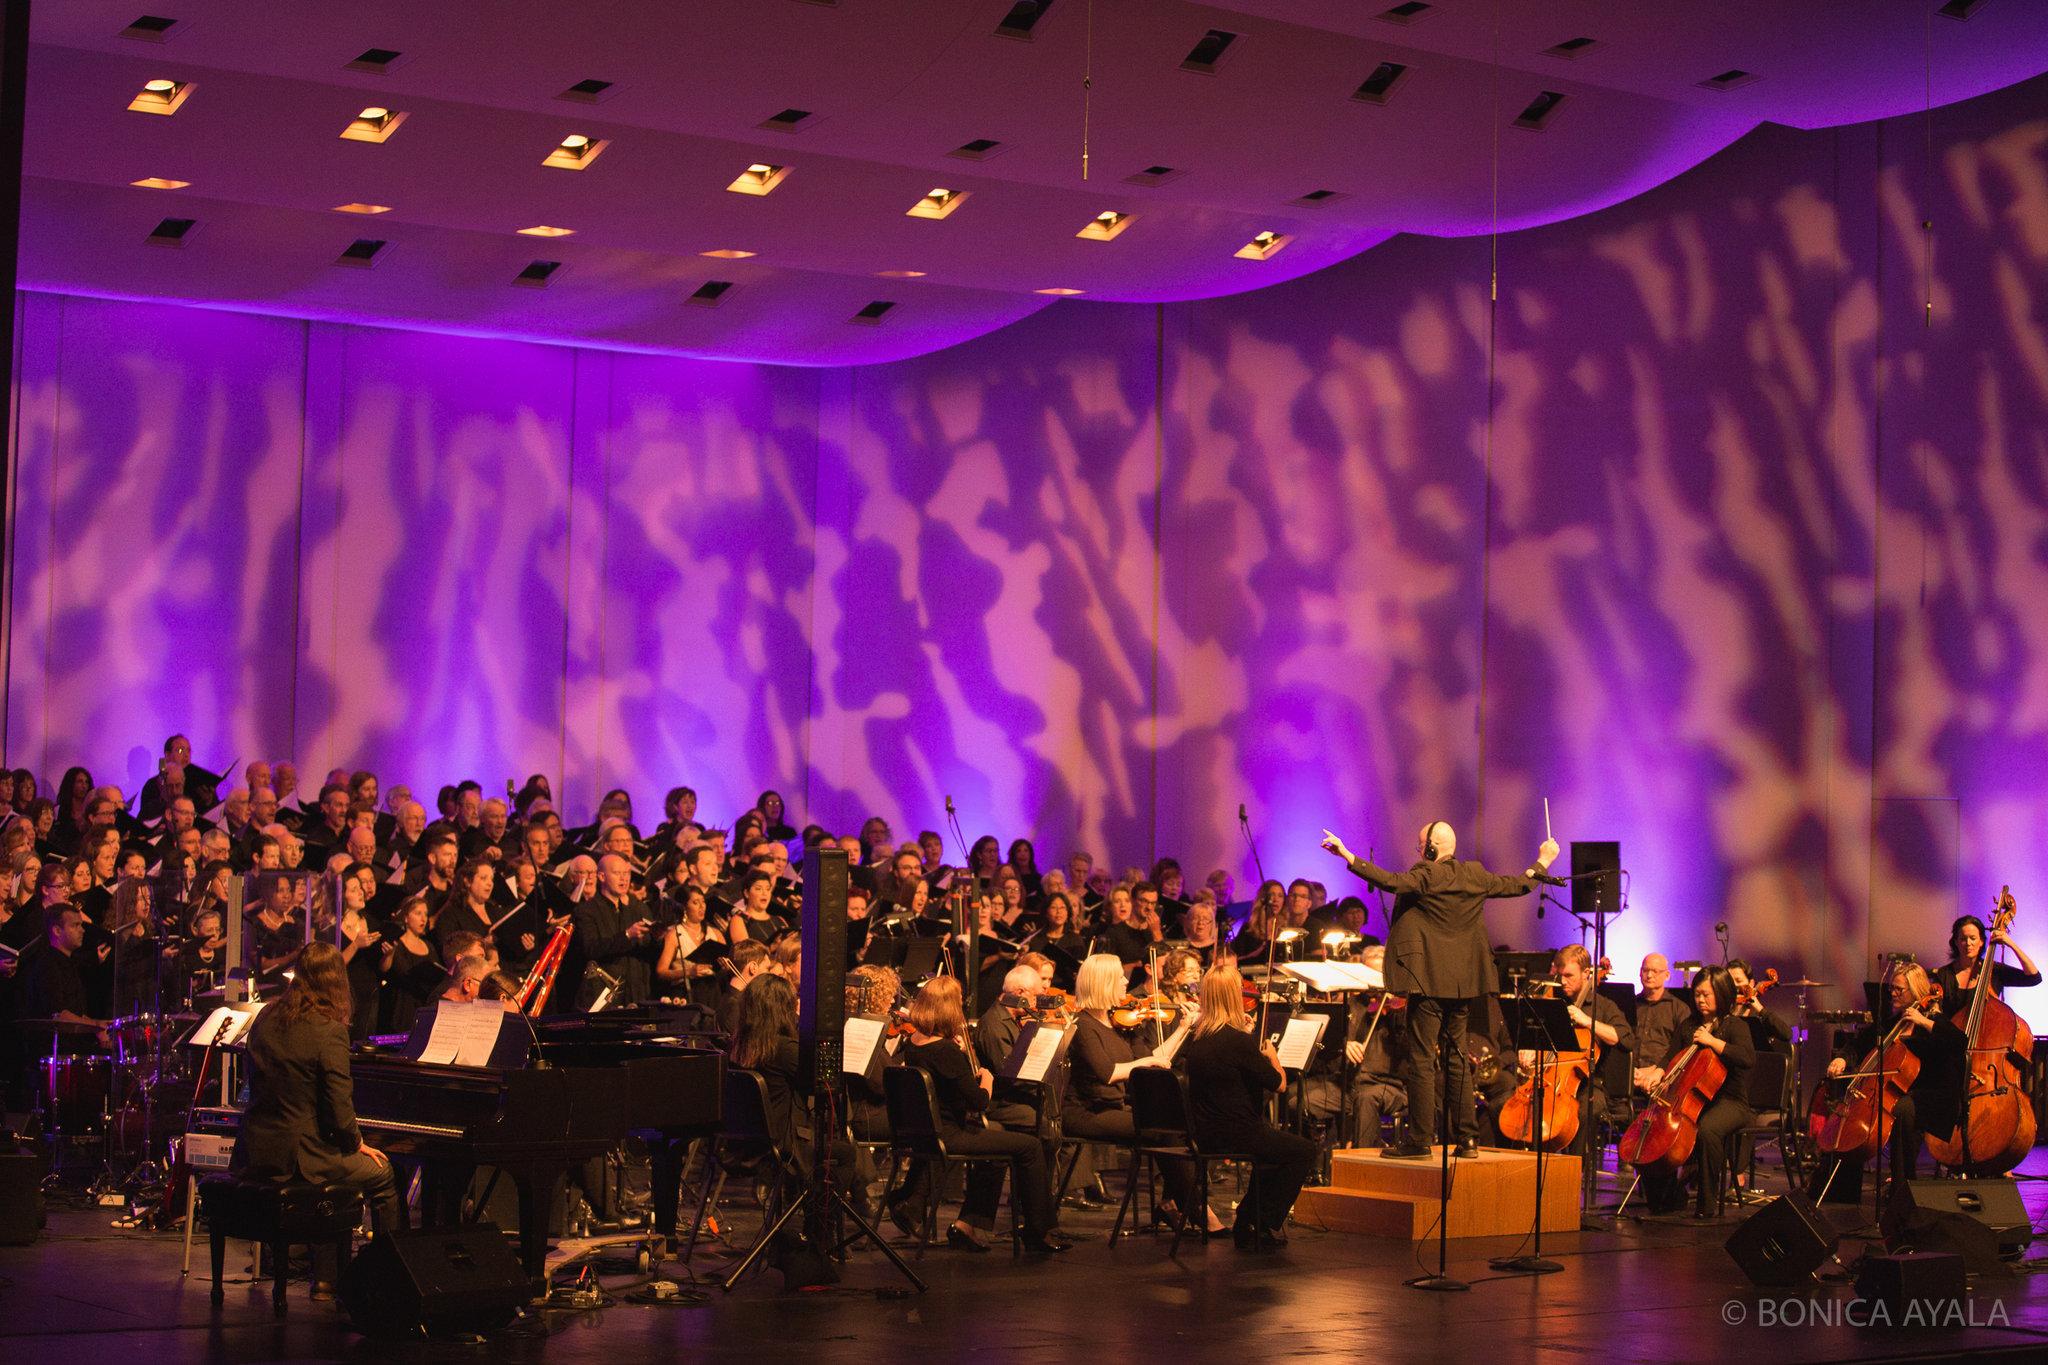 160312-indie-orchestra-night-ayala-9784.jpg